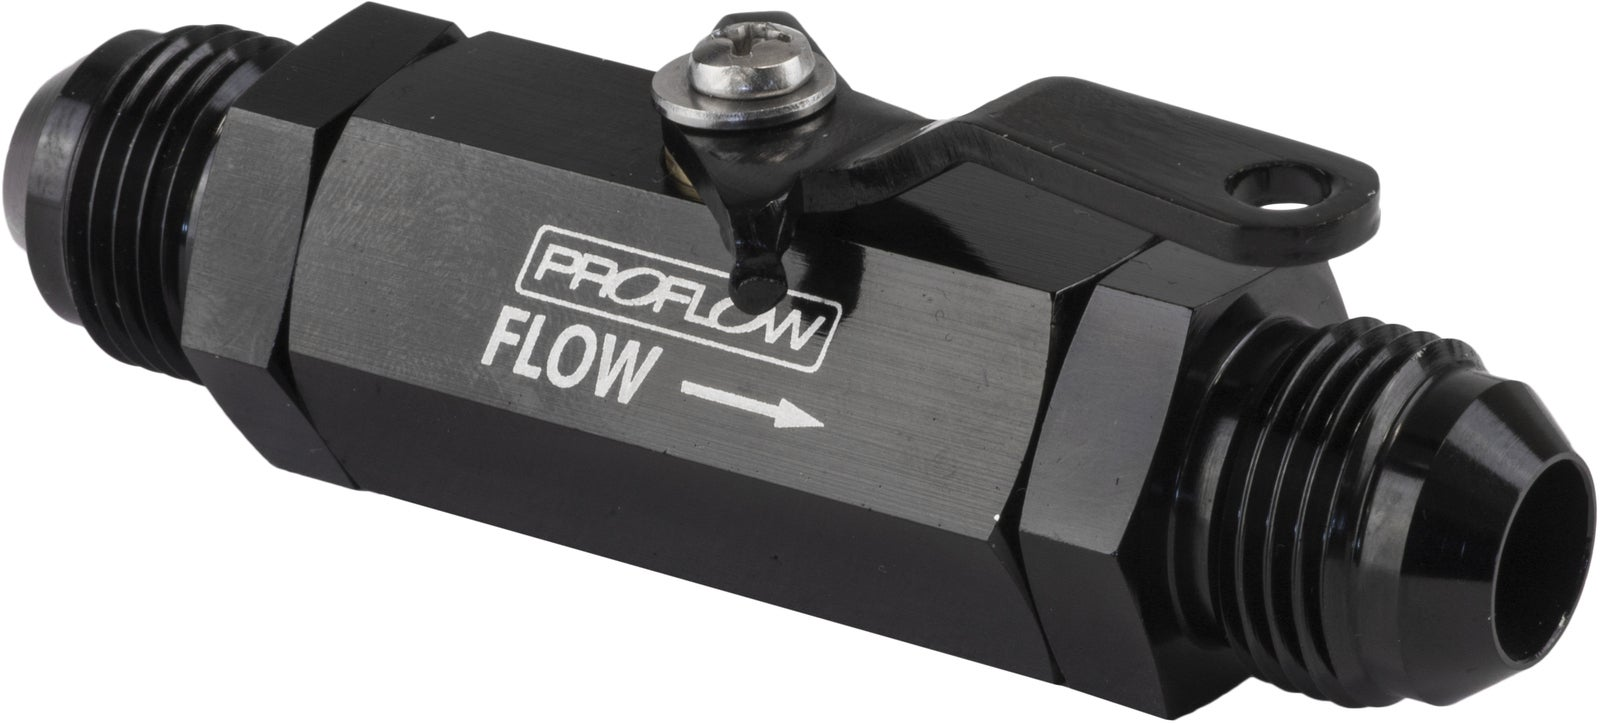 Proflow Valve Shut-Off Aluminium Black -12 AN Male Threads Each